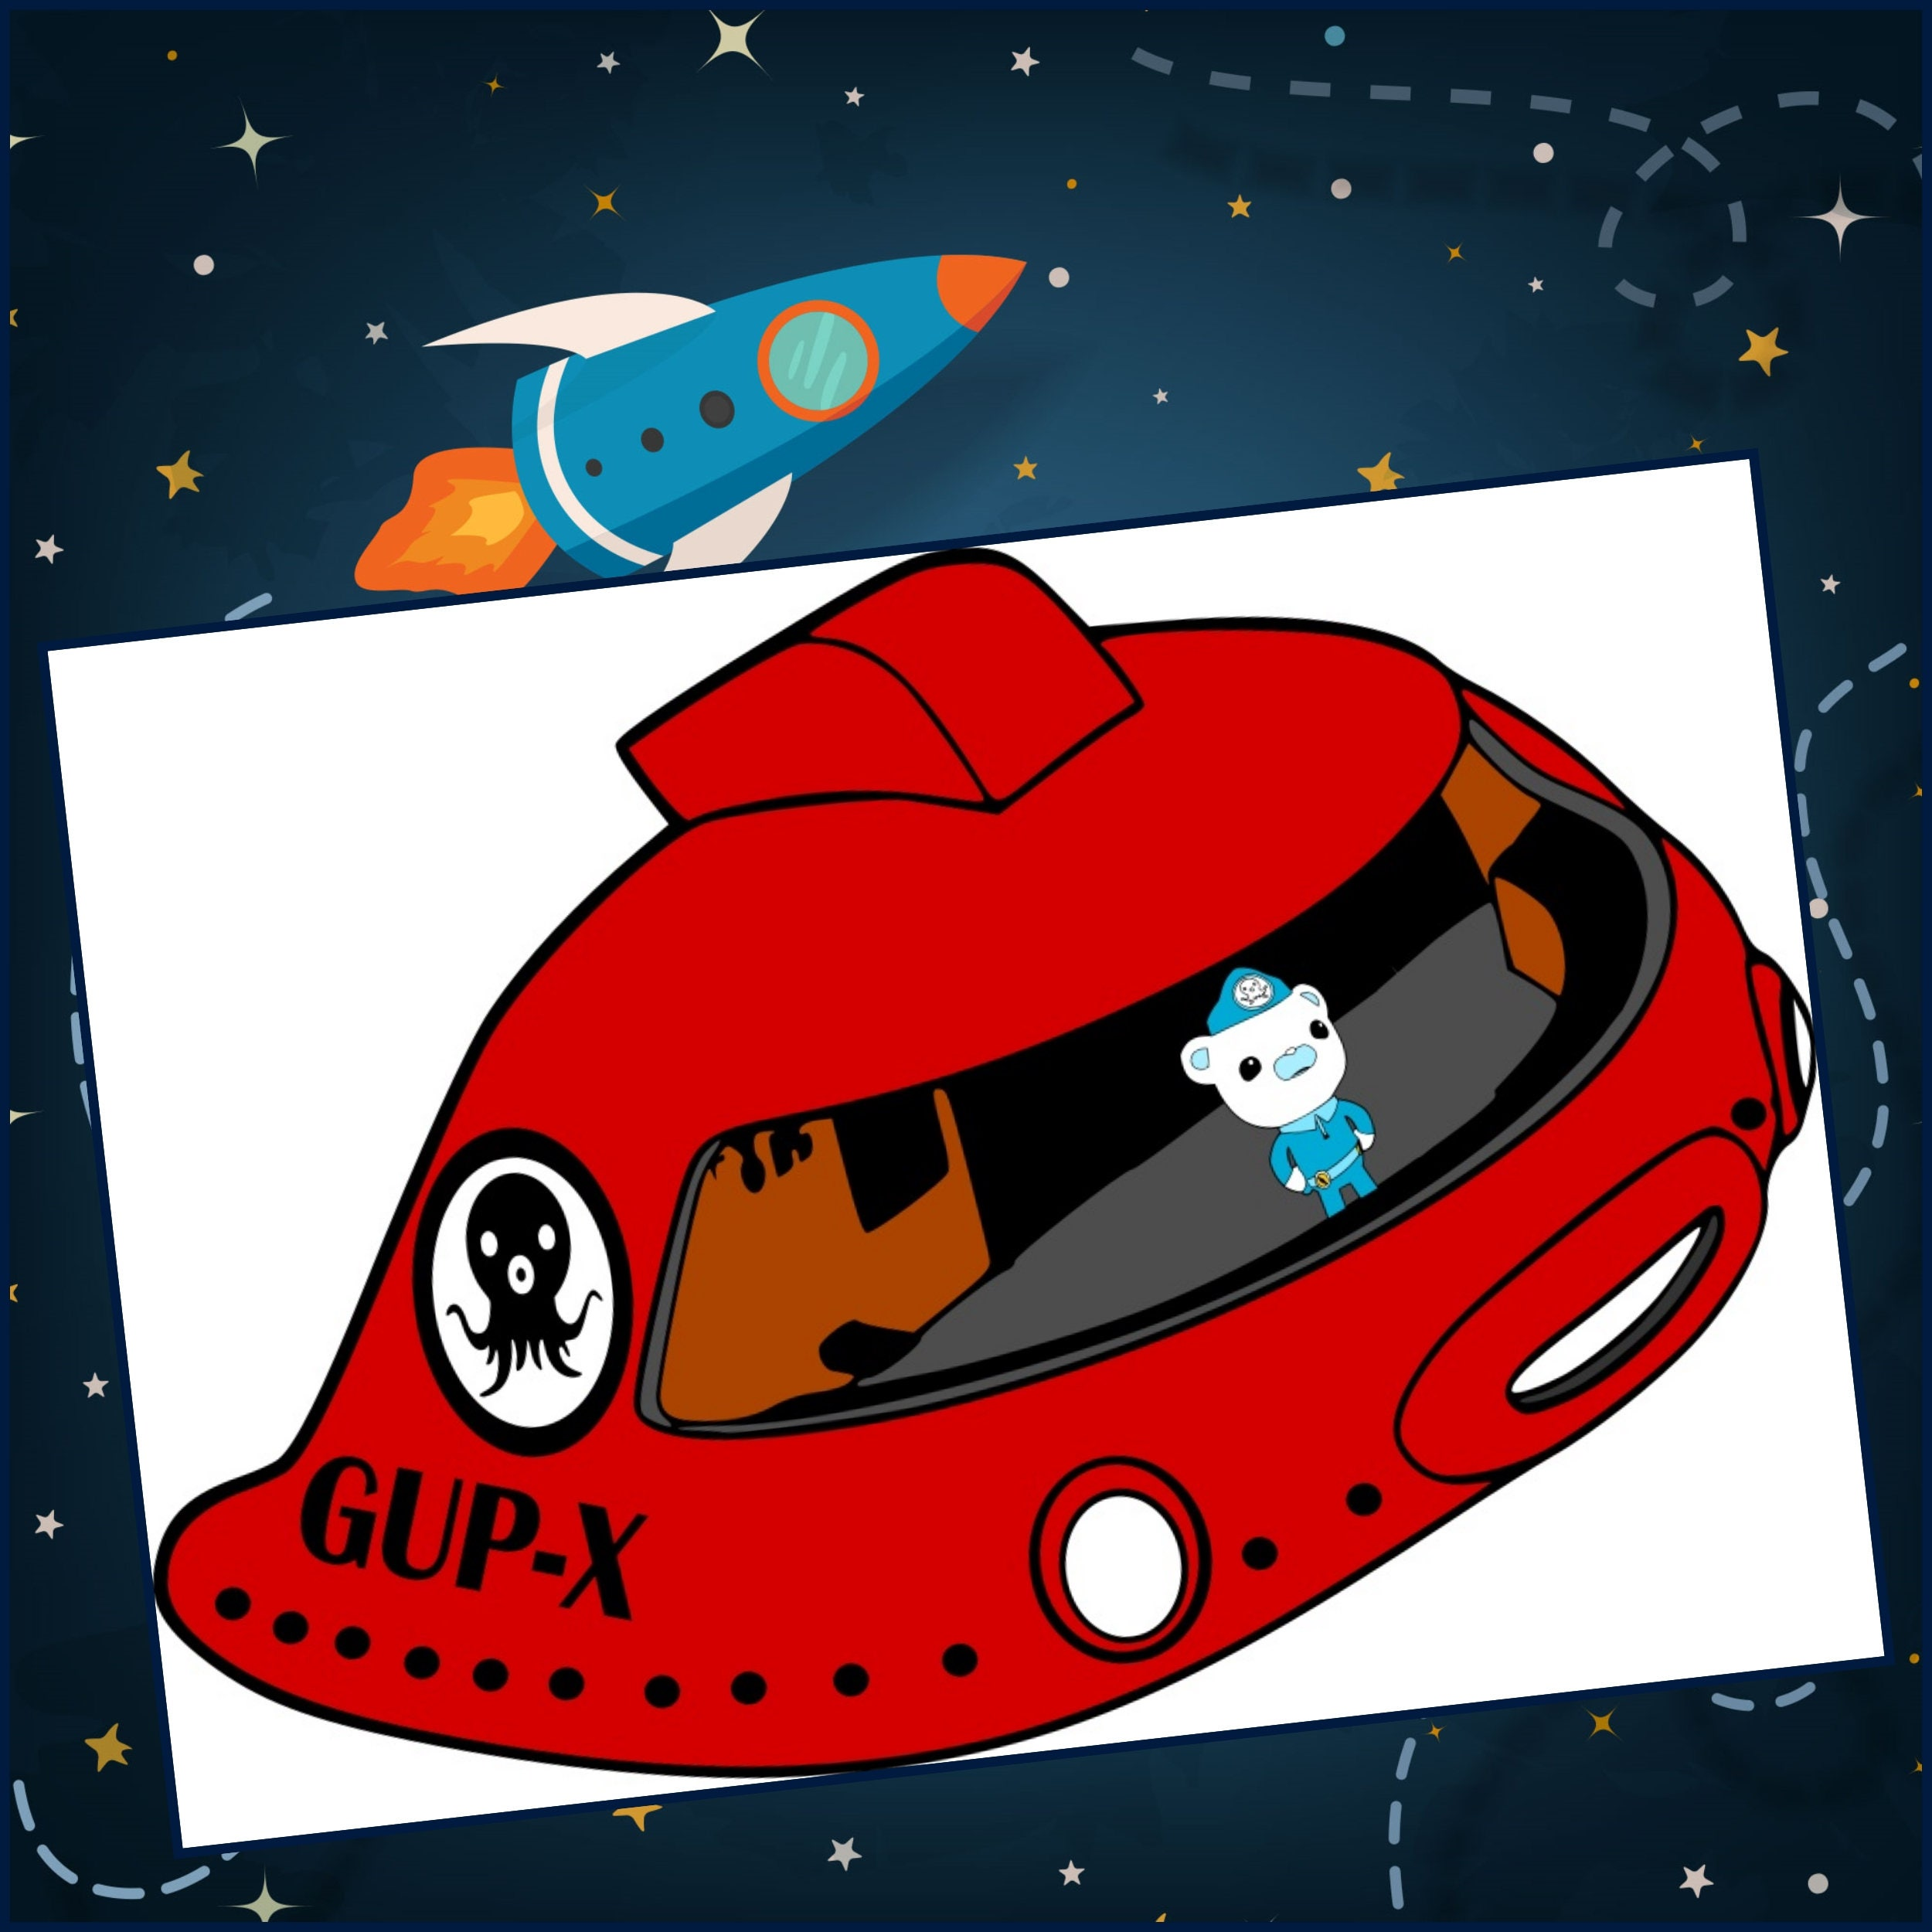 Octonauts SVG Gup-X Layered SVG Ocotnauts Gup-x Designs | Etsy